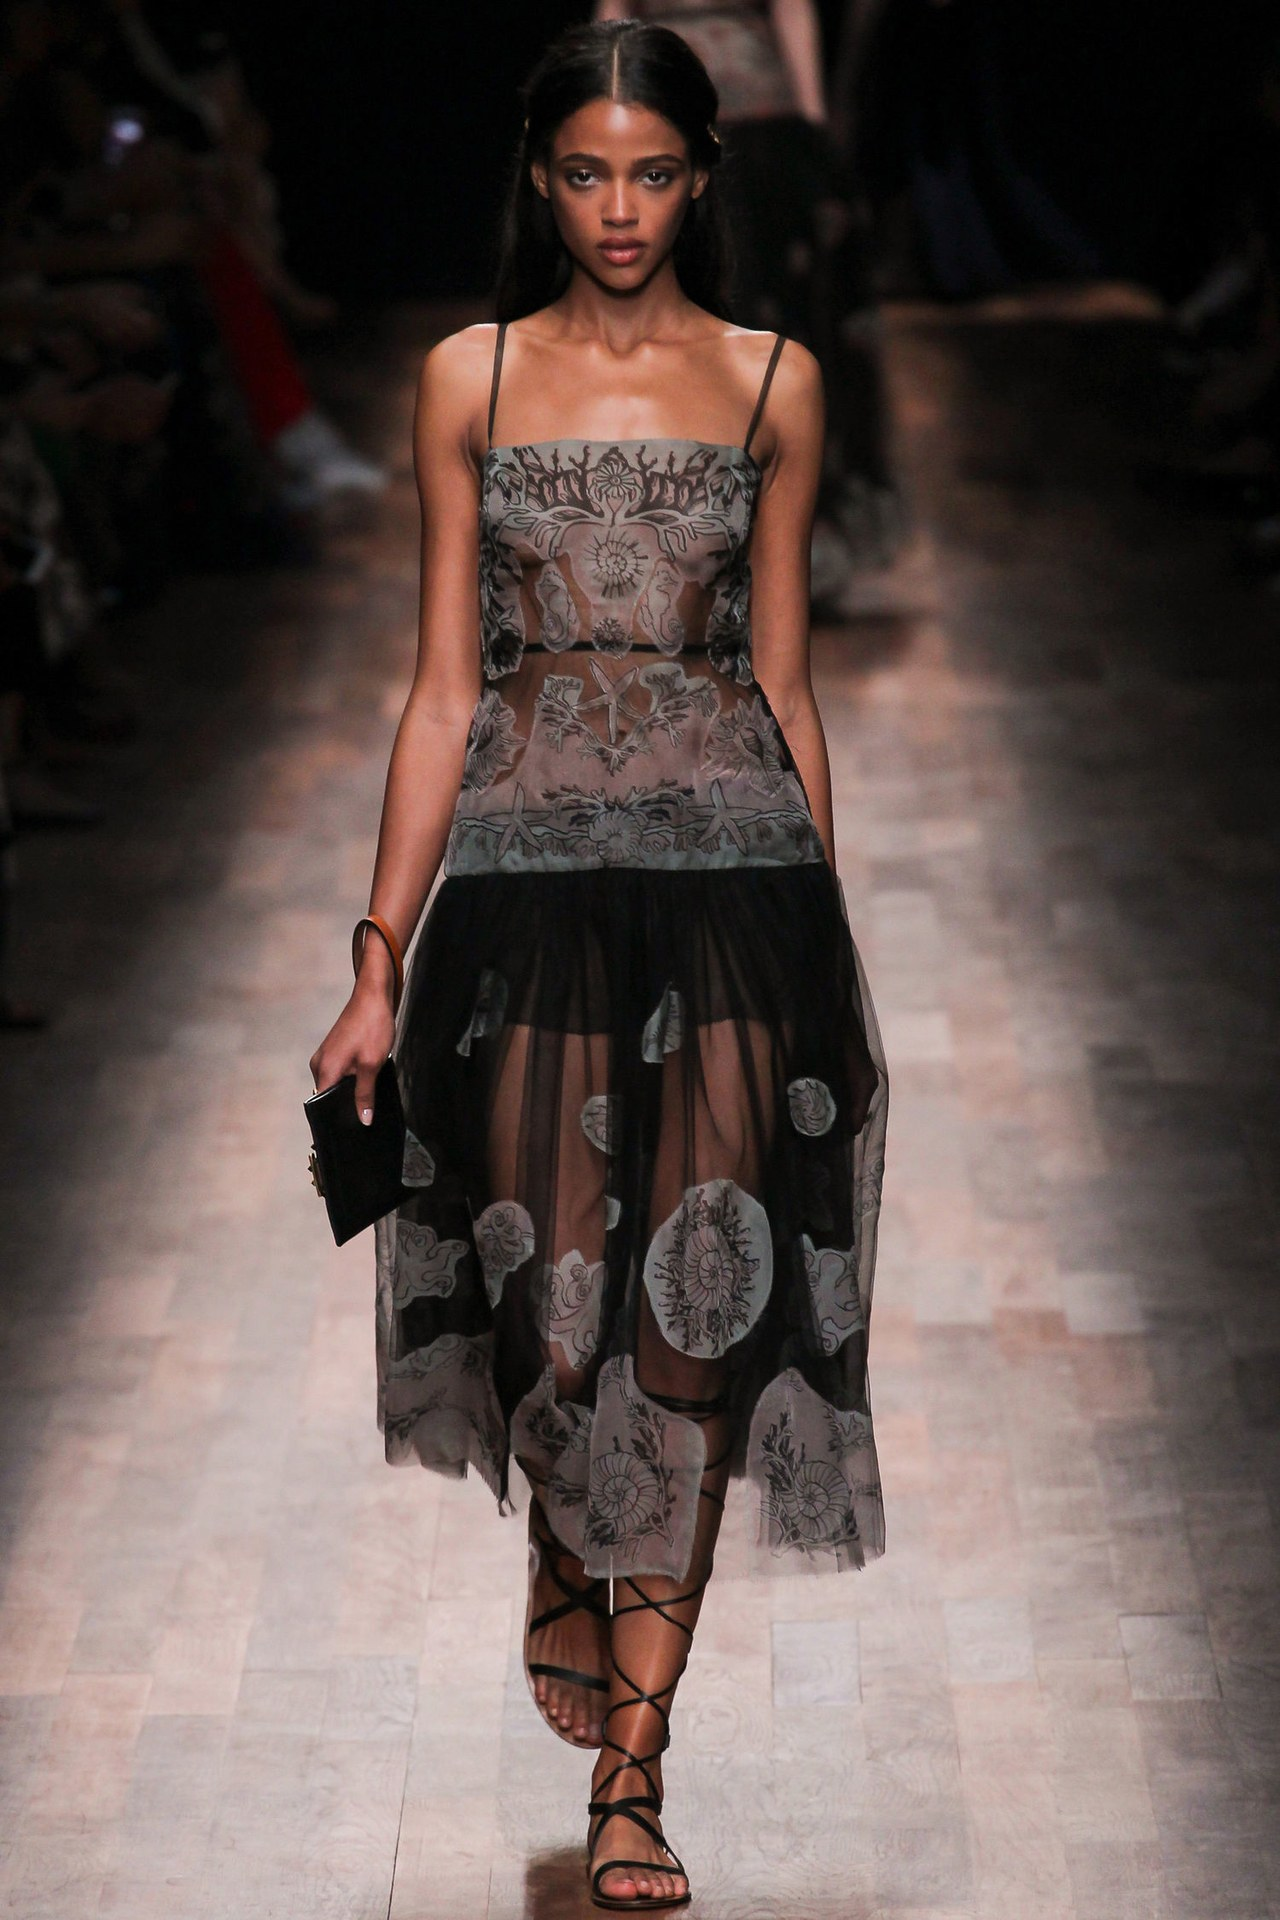 Sheer_Fashion_Blog_Image_ (3).jpg